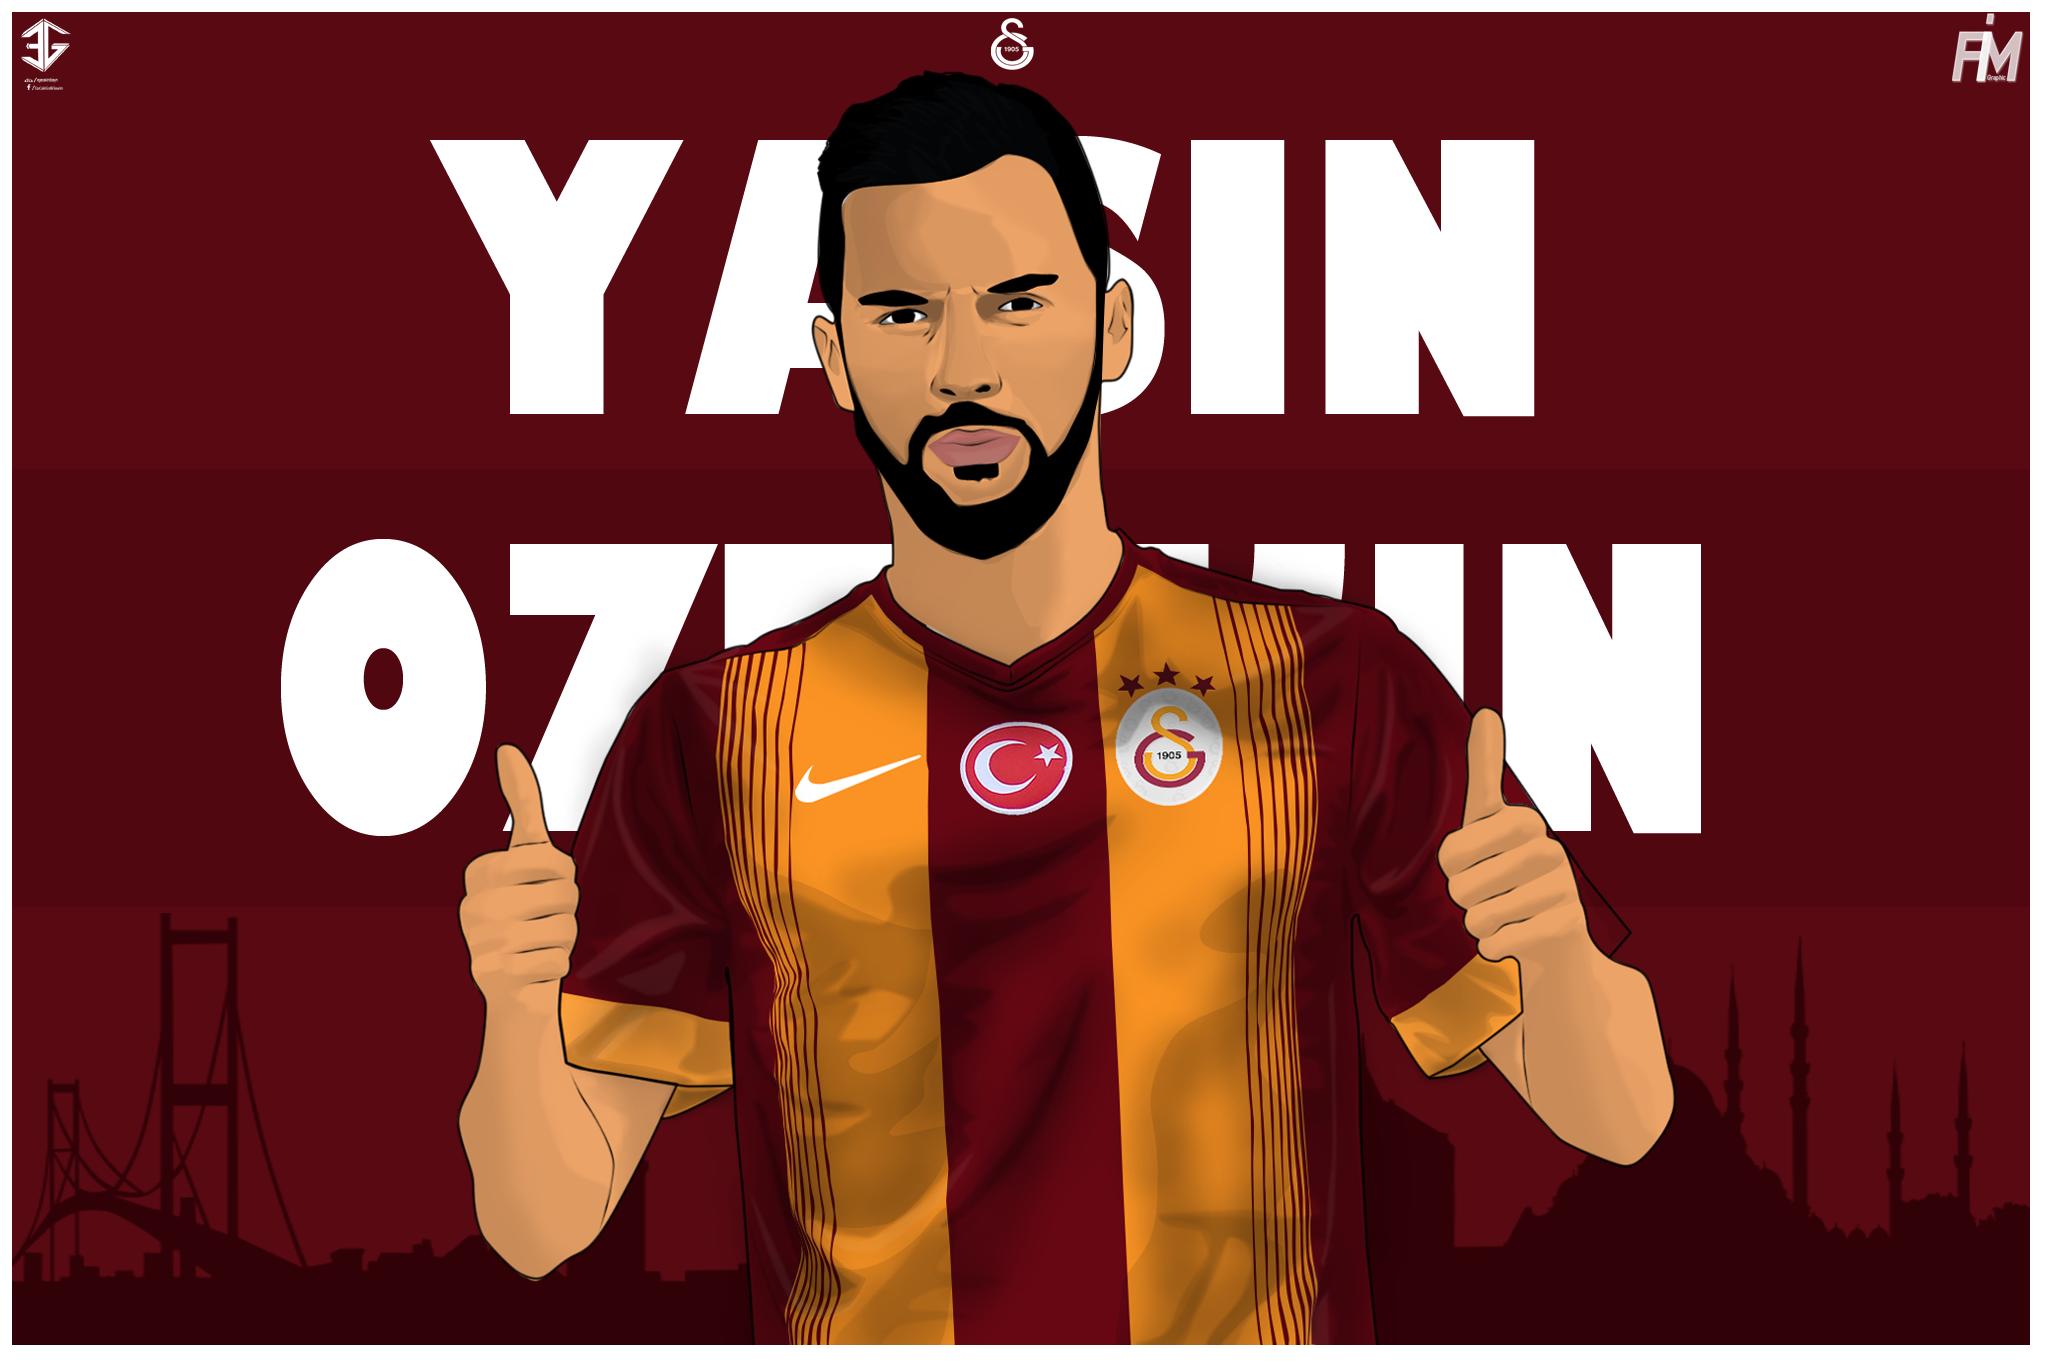 Yasin Oztekin by hdtvibo on DeviantArt